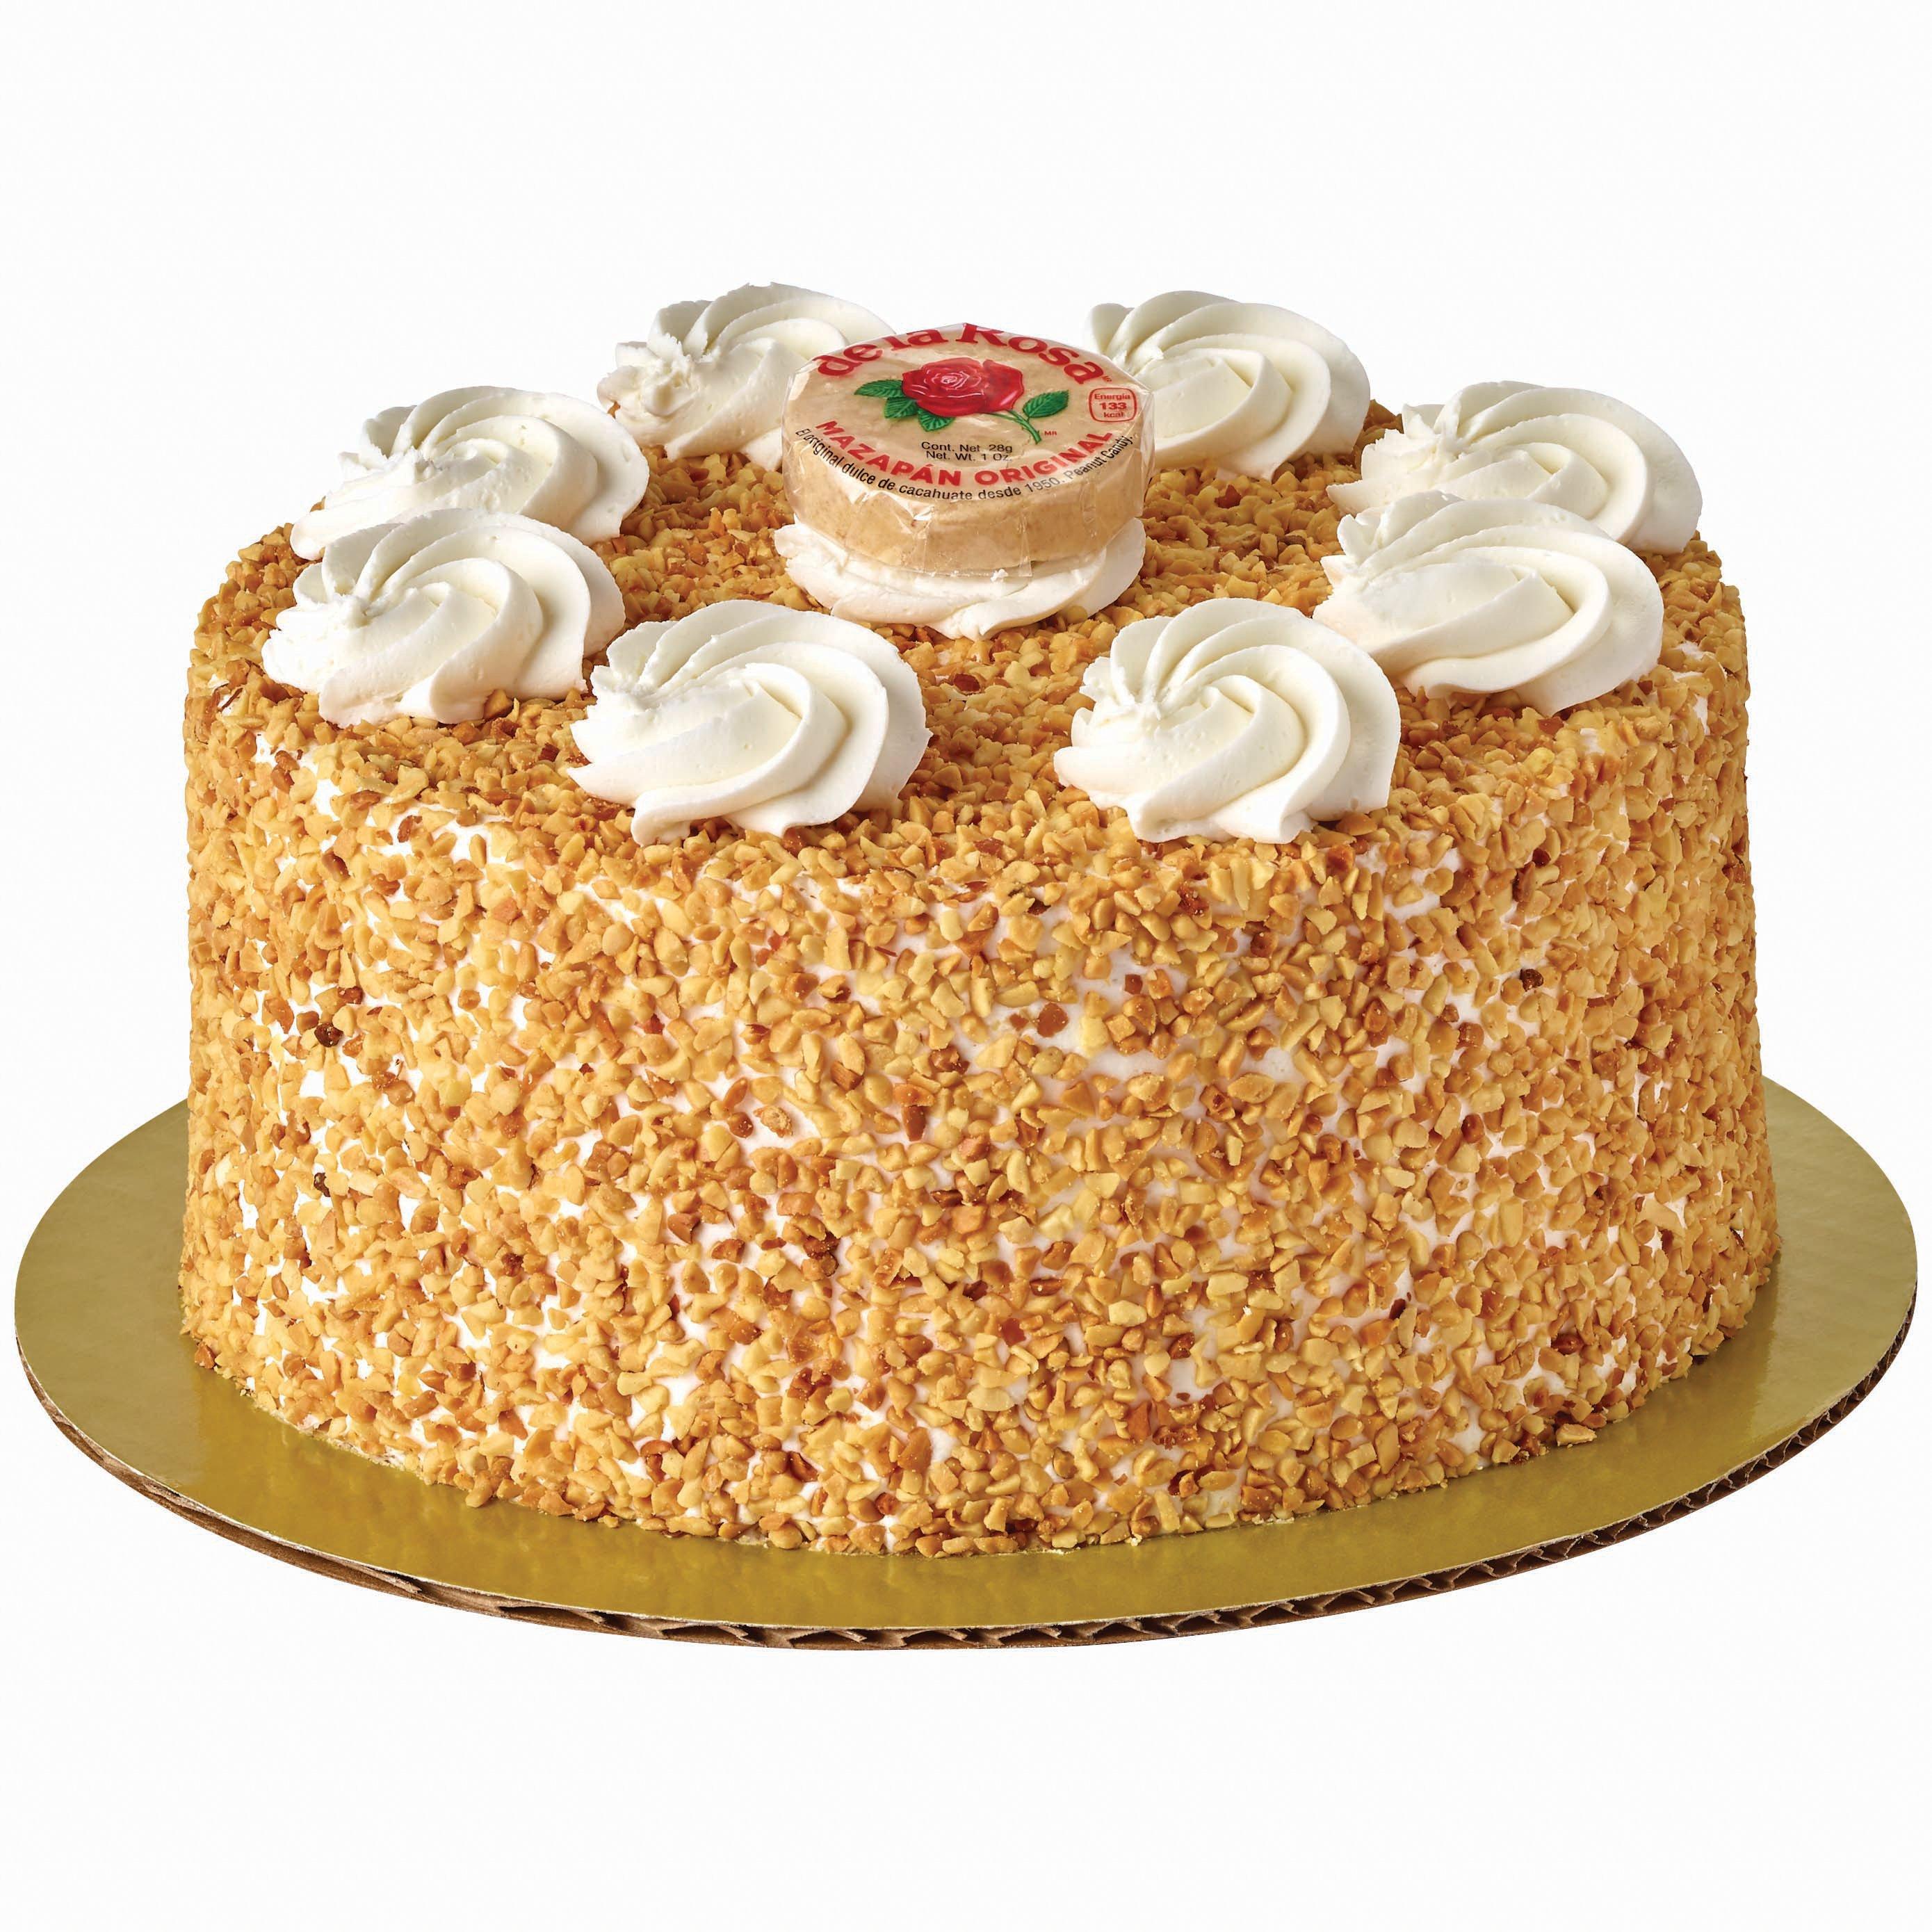 H‑E‑B Mazapan Cake ‑ Shop Cakes at H‑E‑B